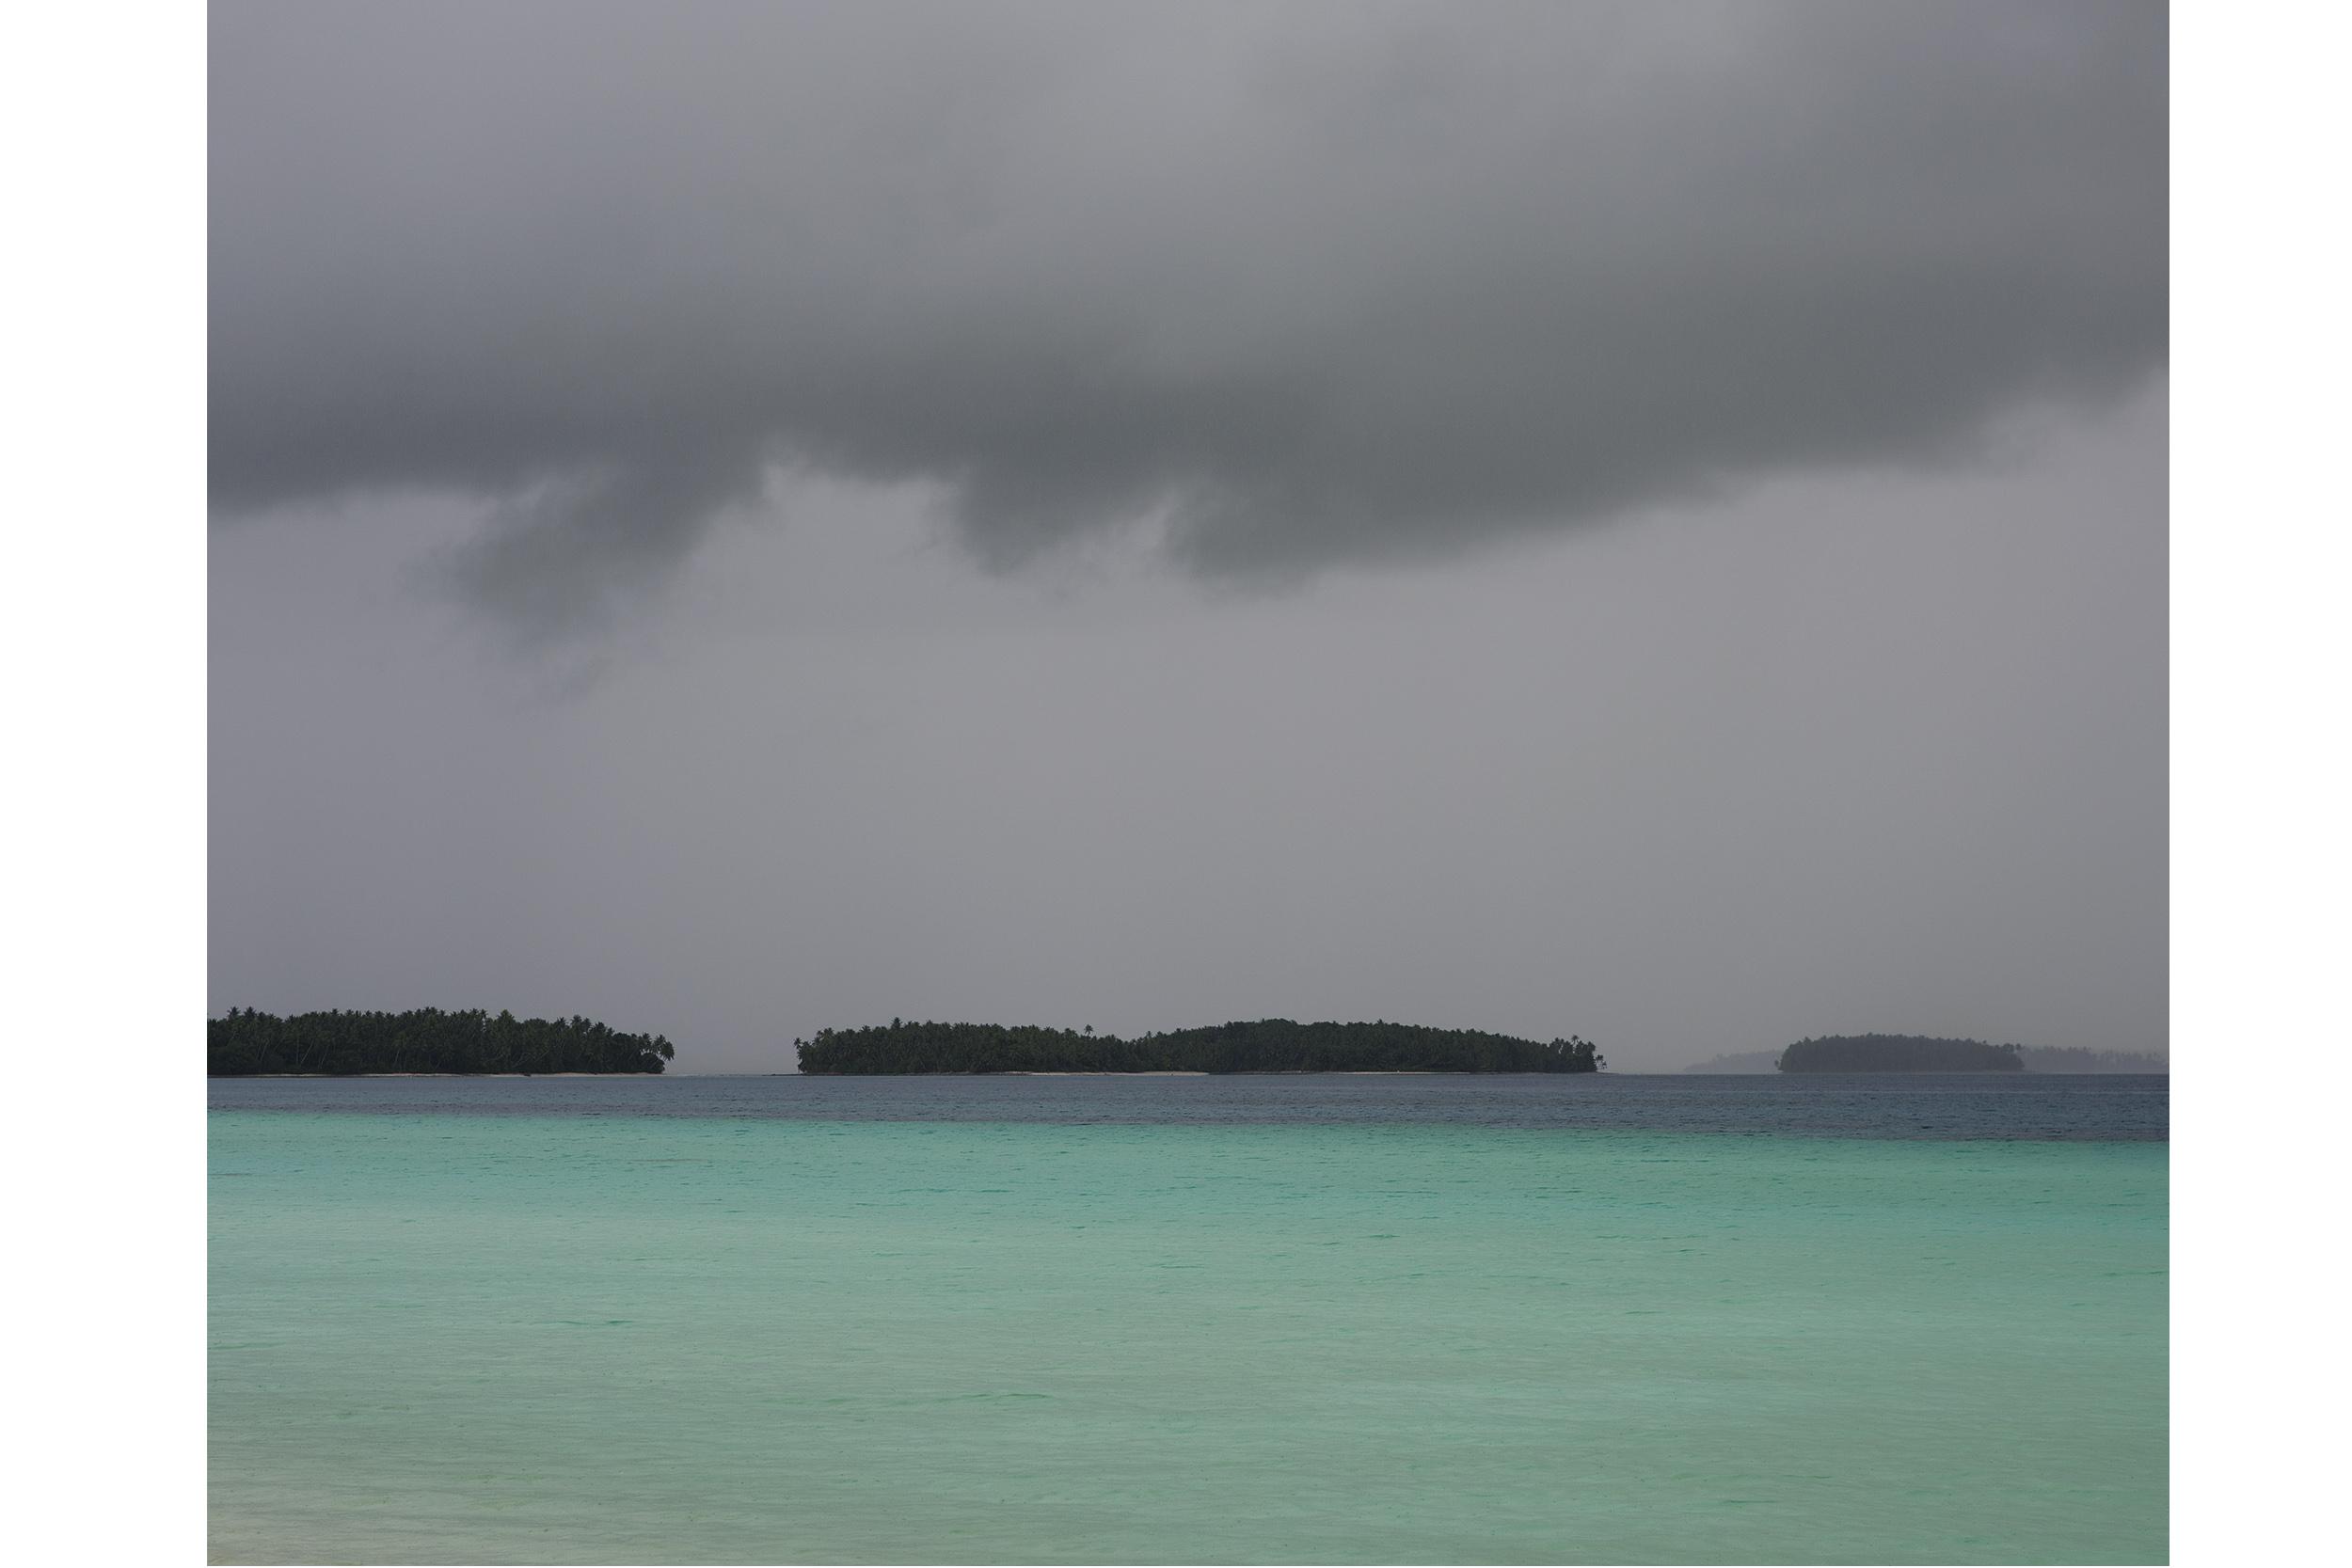 Rainstorm, Arno Atoll (2015)